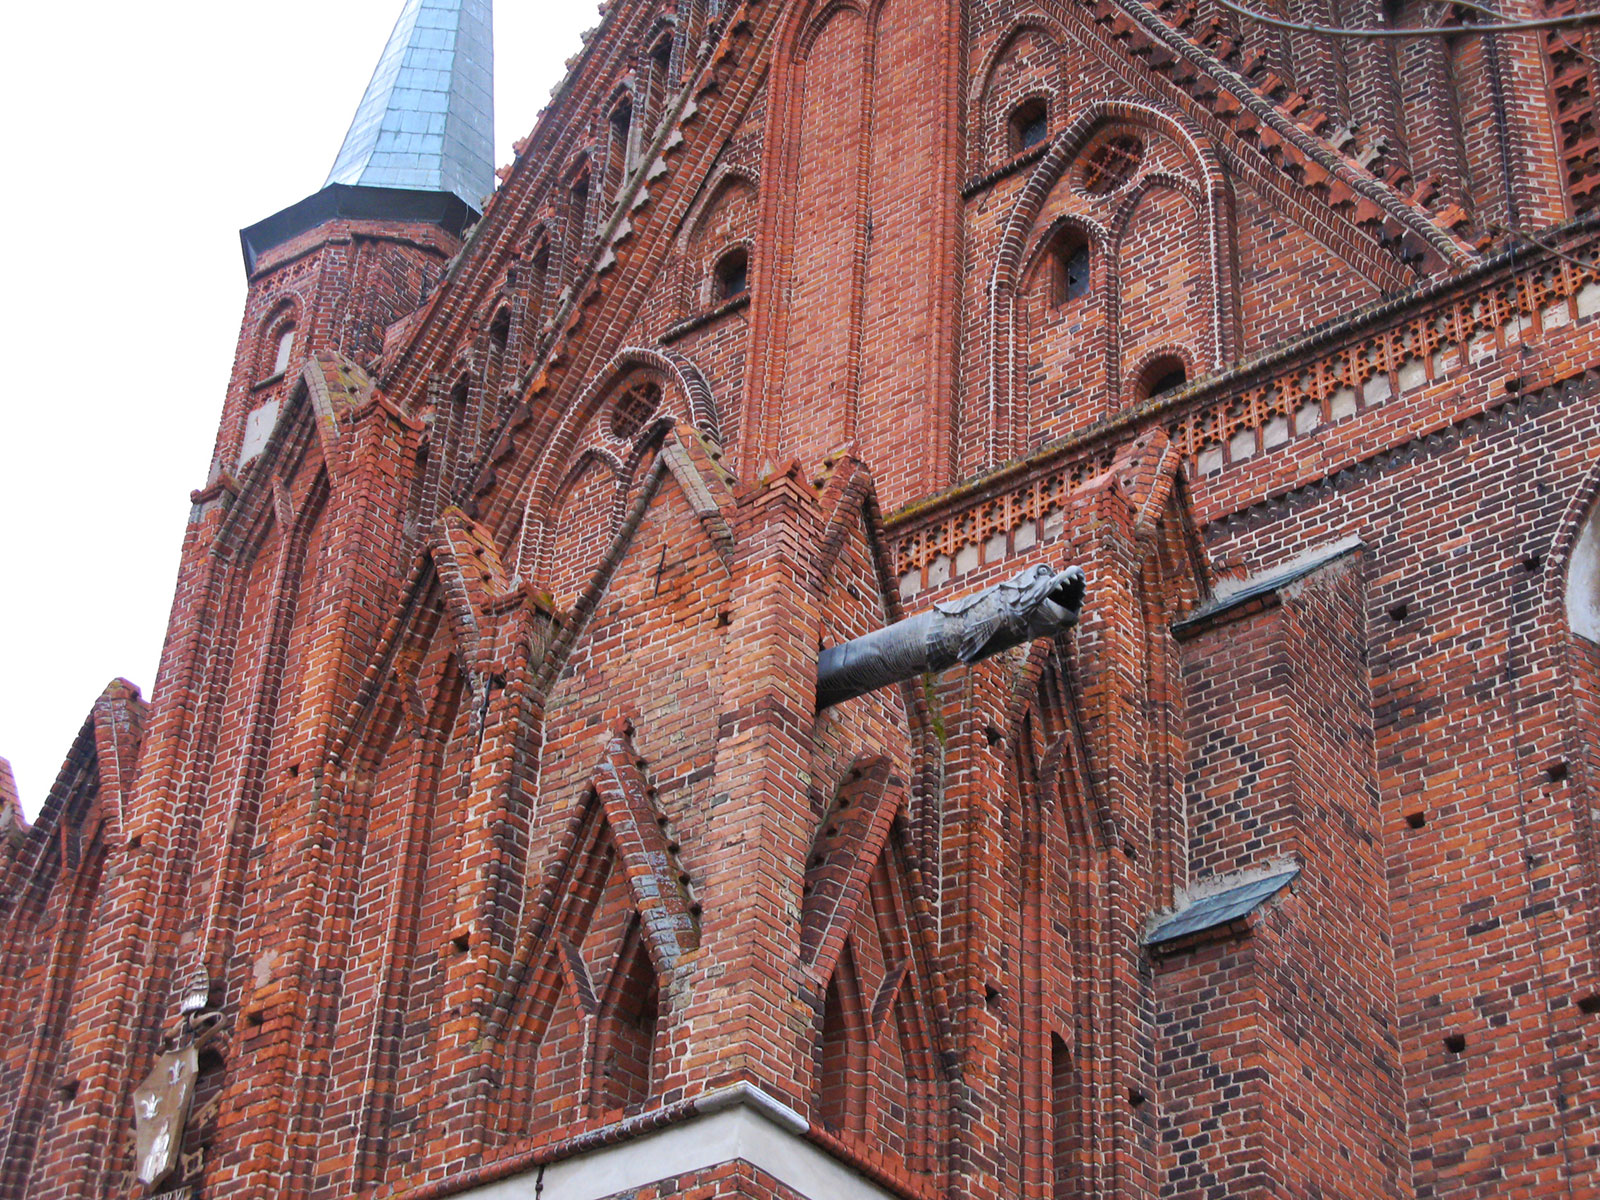 frombork-gotika